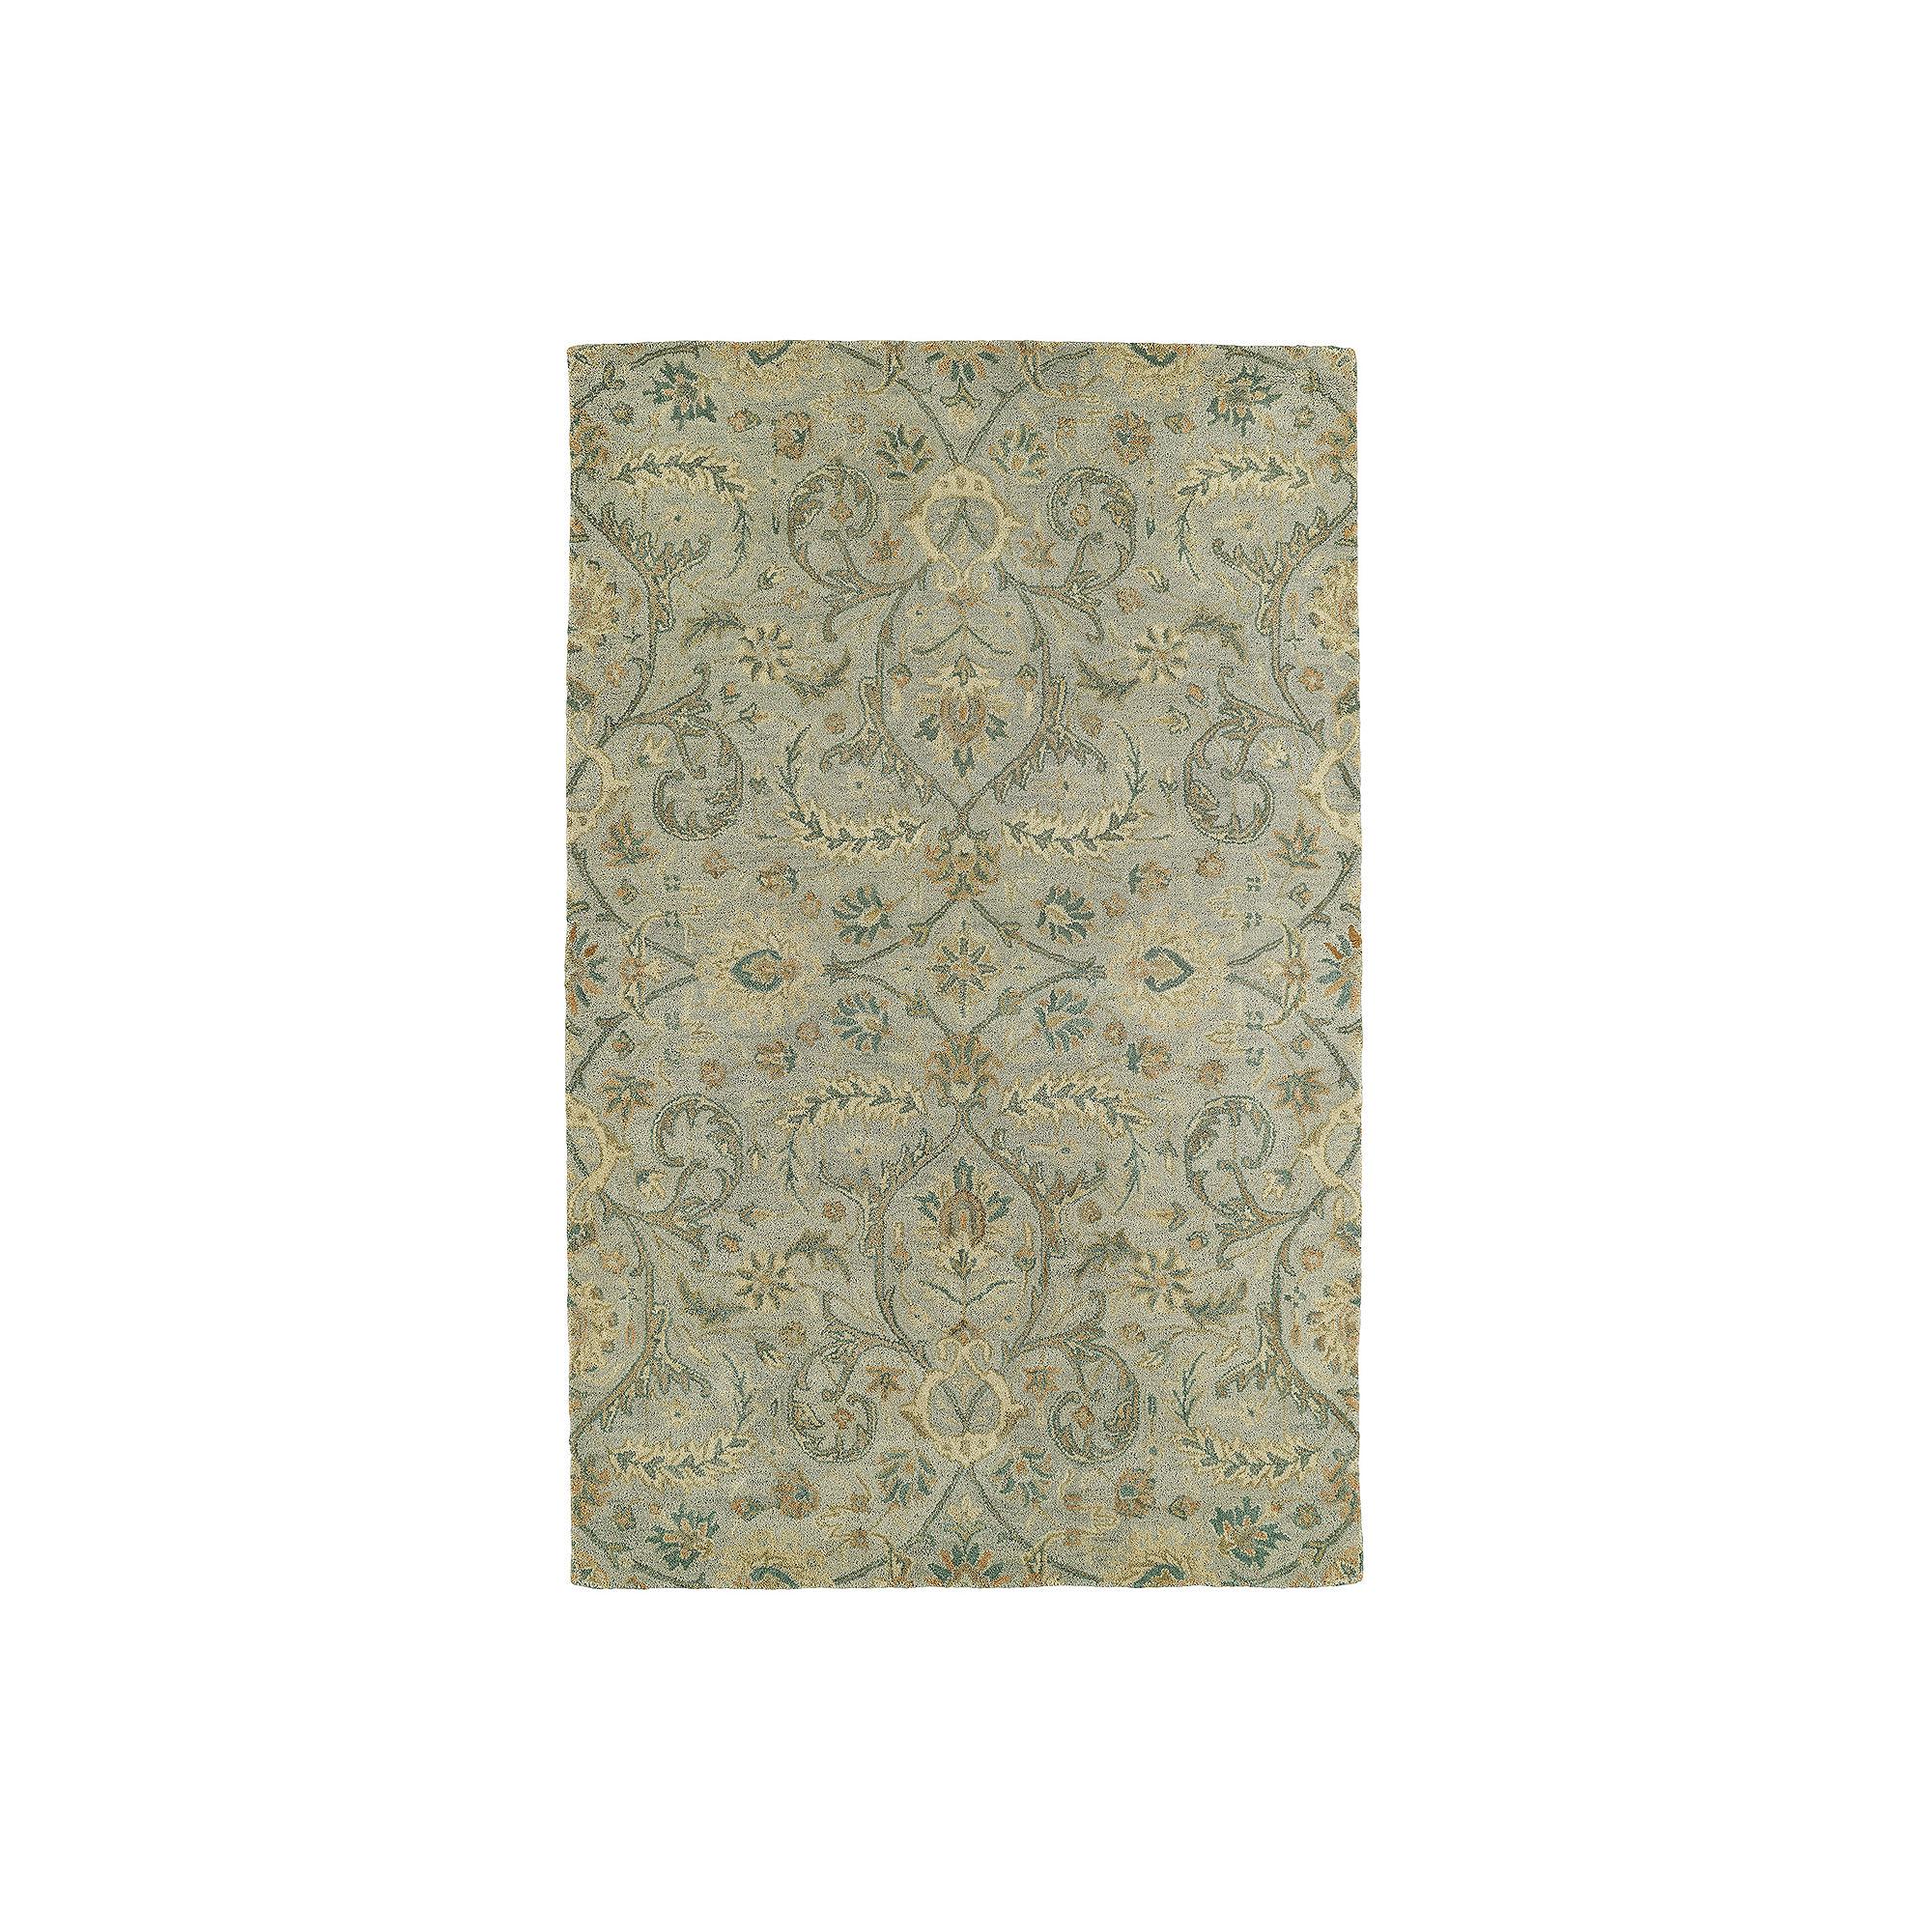 Kaleen Helena Athena Hand-Tufted Wool RectangularRug